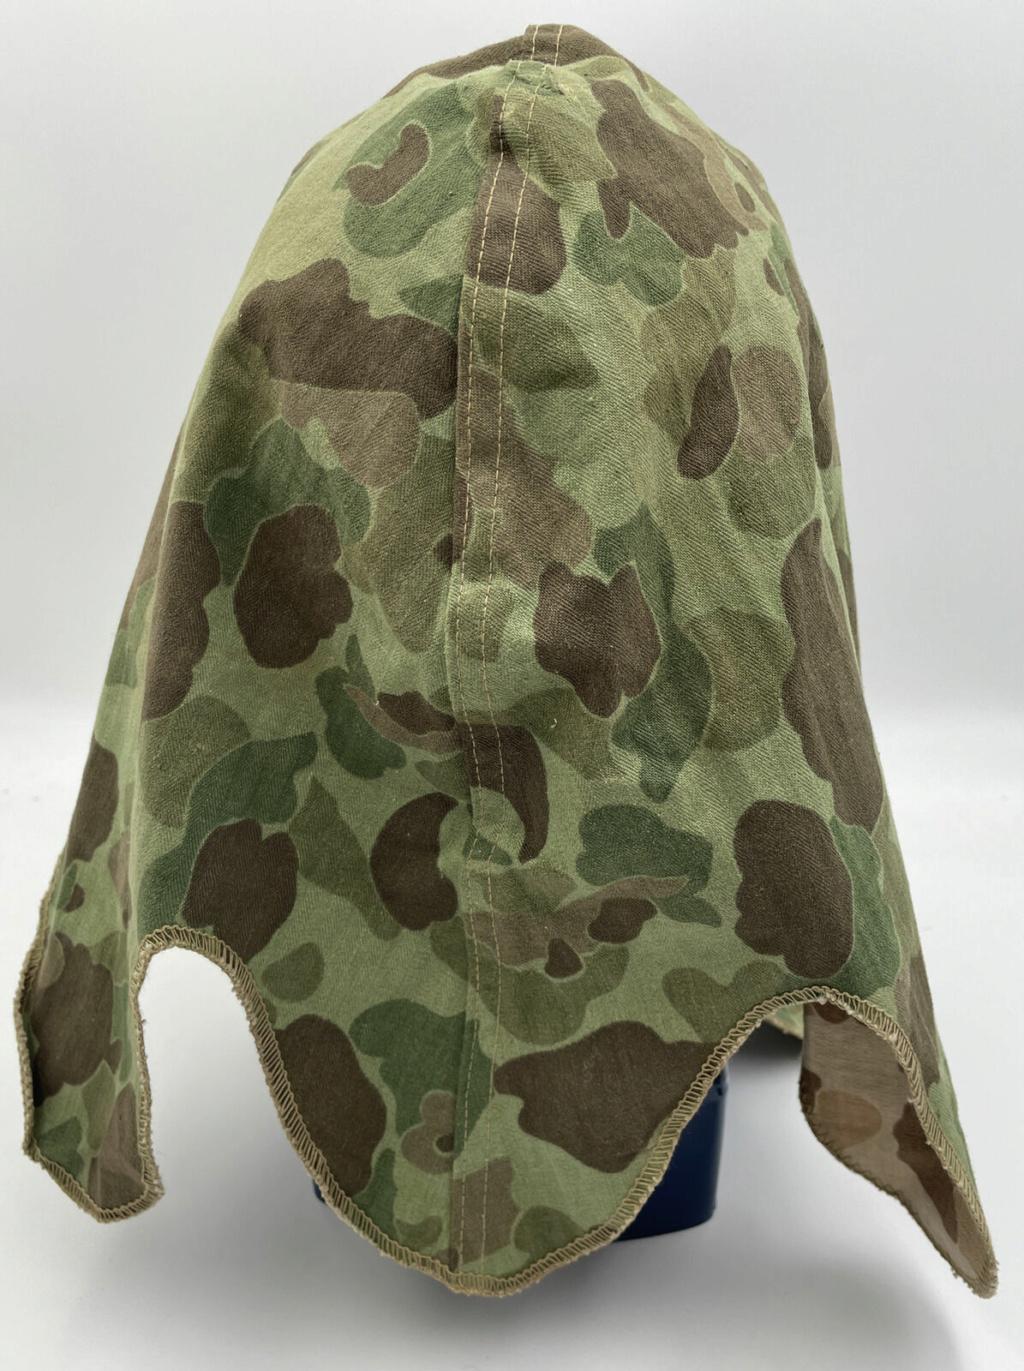 Couvre-casque USMC 149